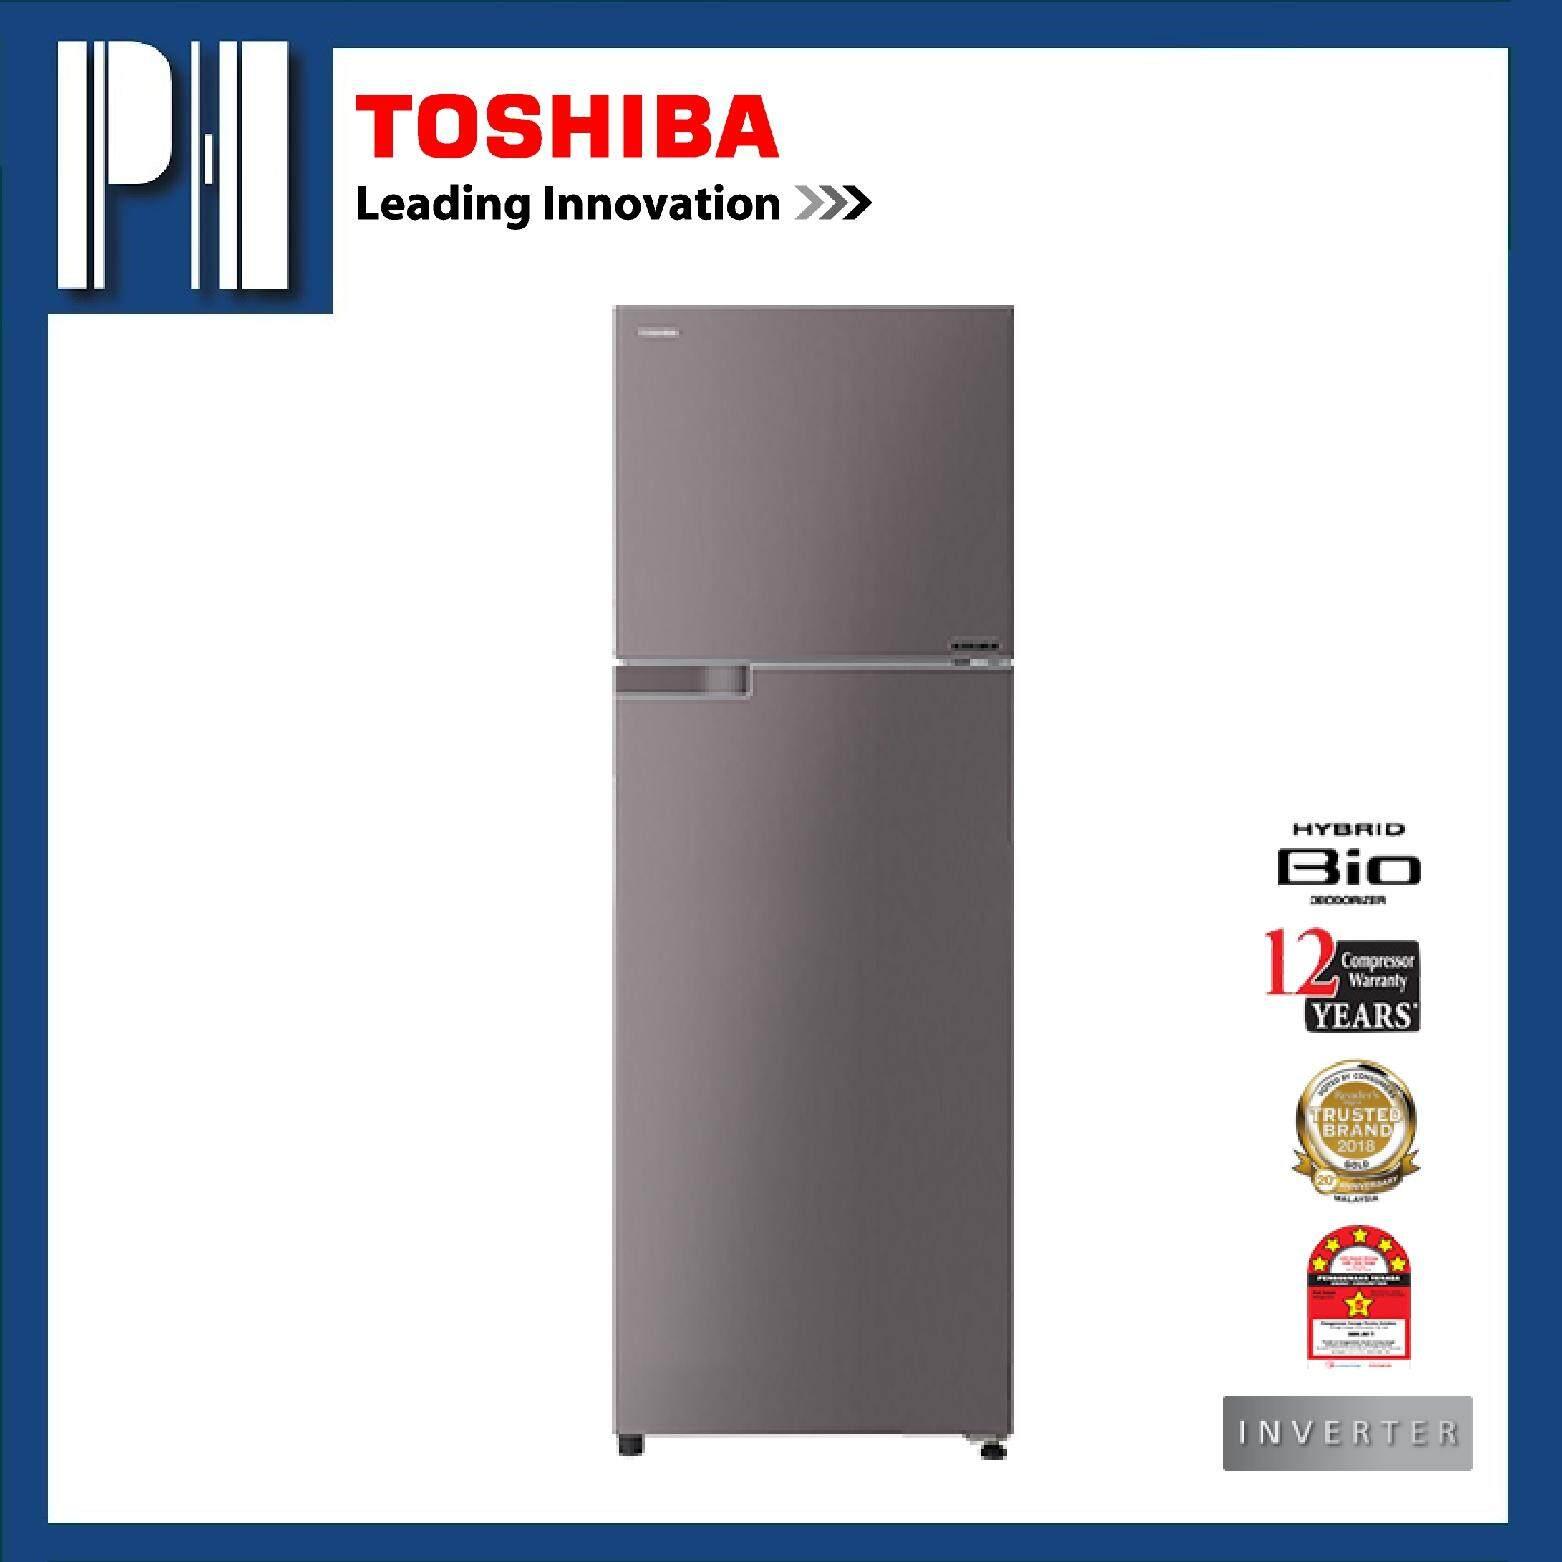 TOSHIBA GR-A39MBZ (DS) 390L Inverter 2 Doors Refrigerator/Fridge (Dark  Silver)